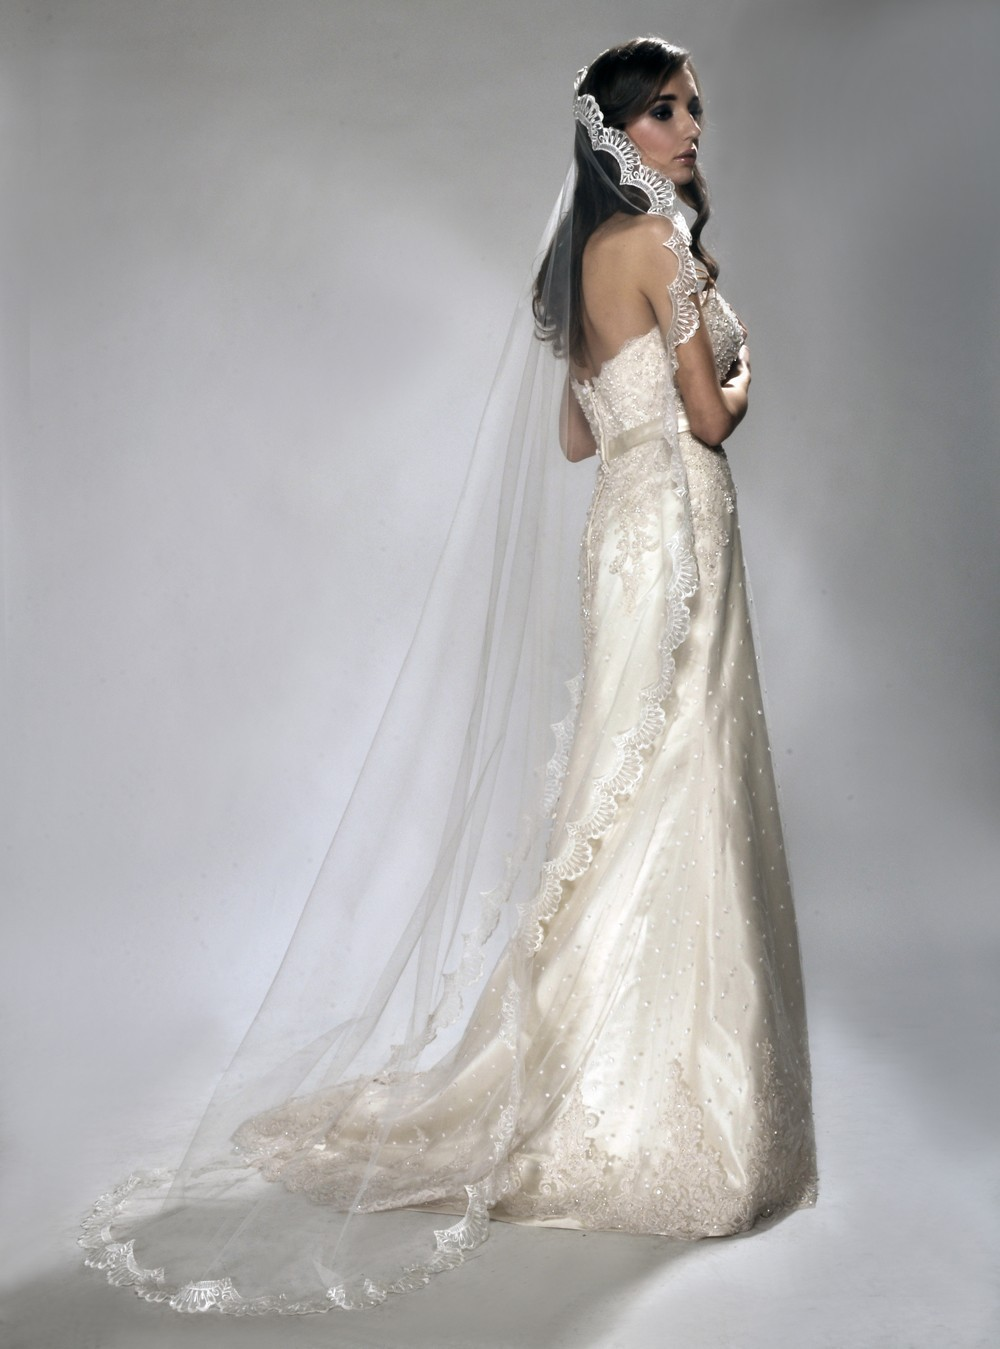 Romantic-wedding-accessories-bridal-head-chic-mantilla-veils-chapel-lace.full